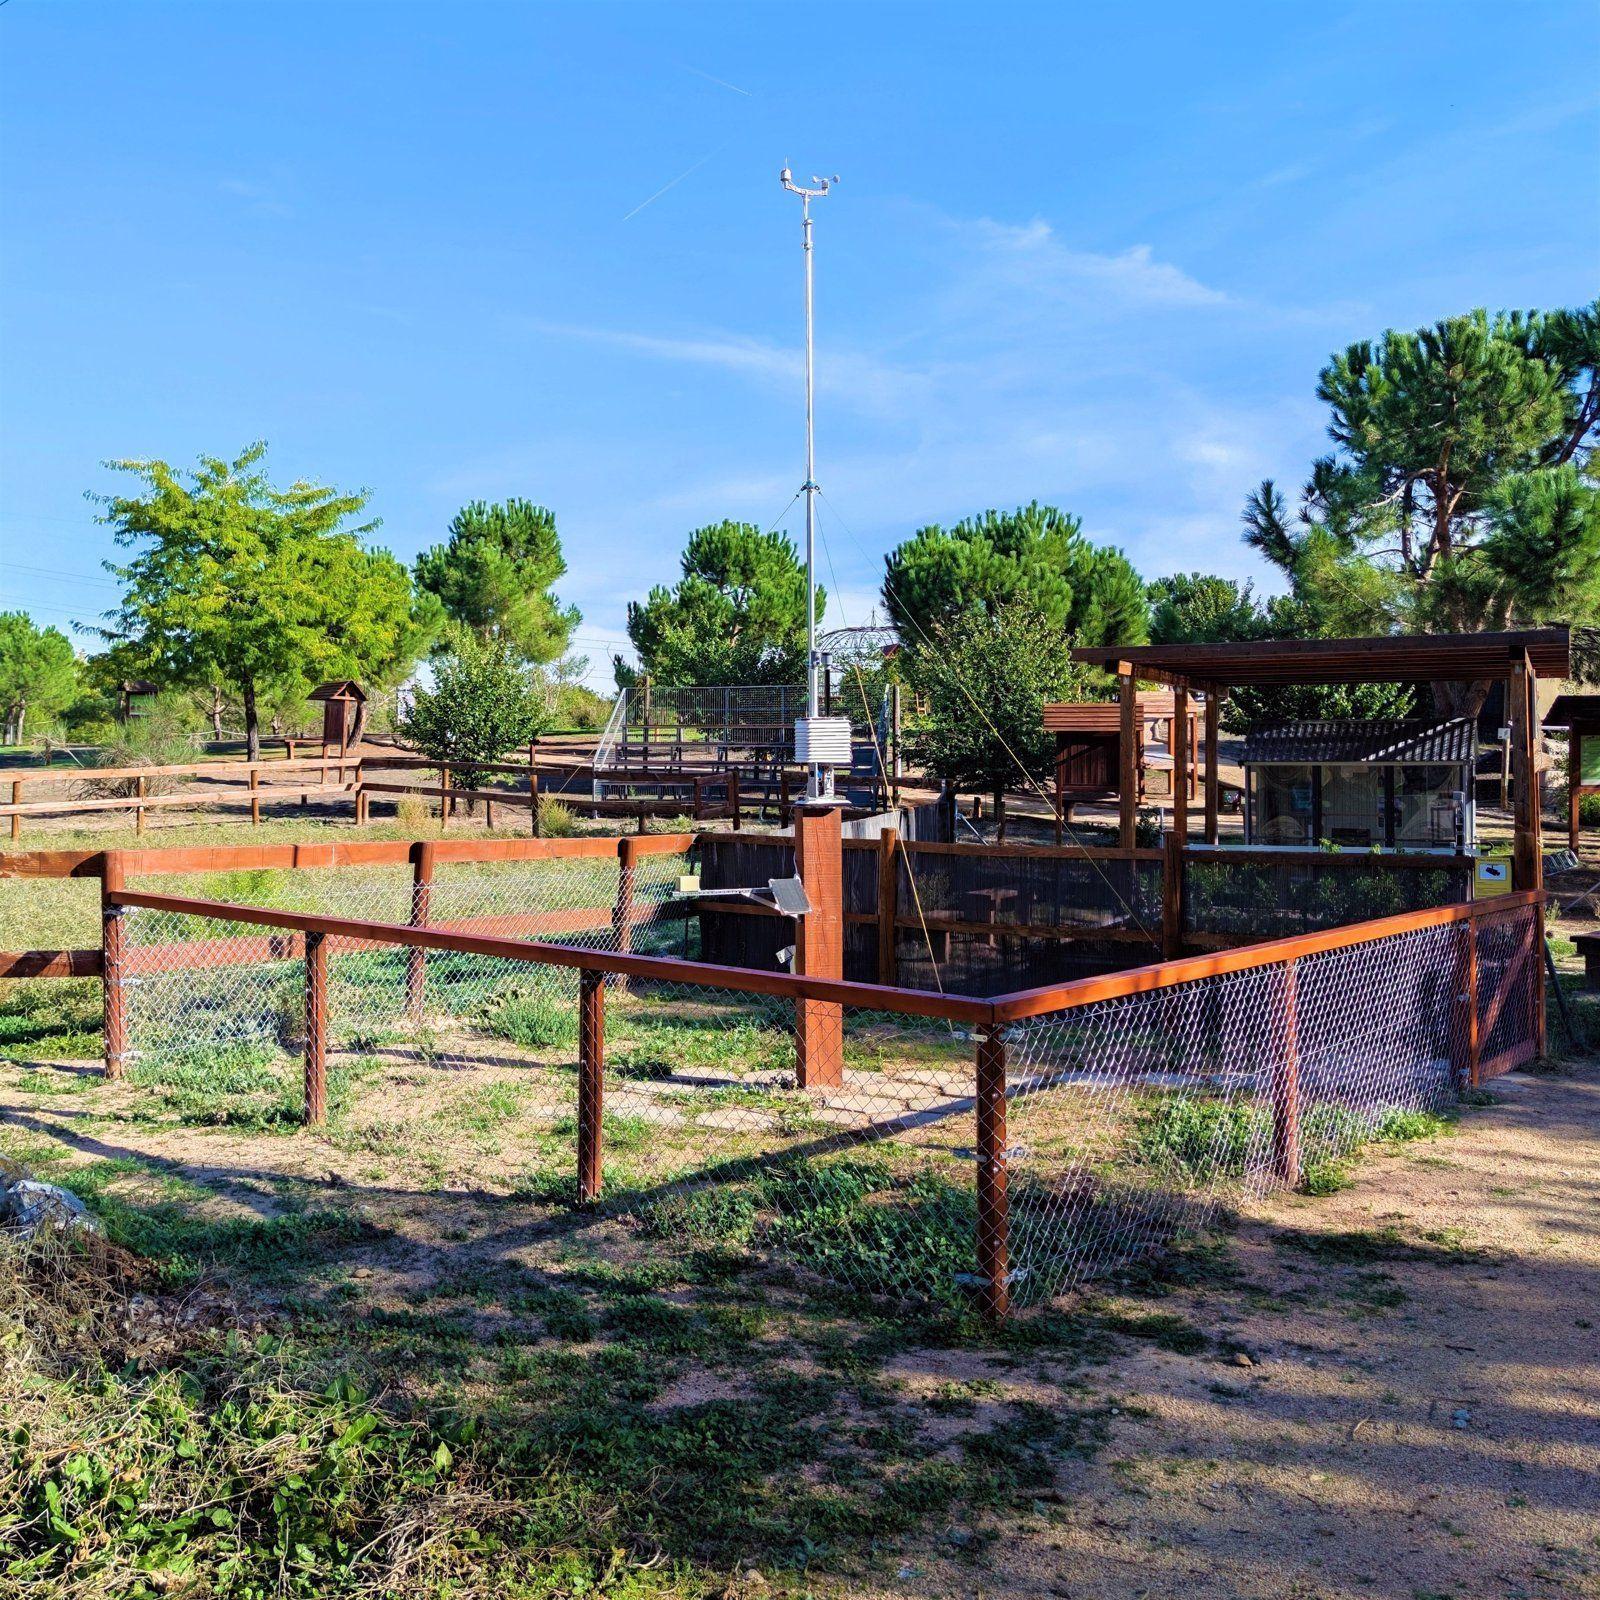 Pozuelo plan piloto estación meteorológica